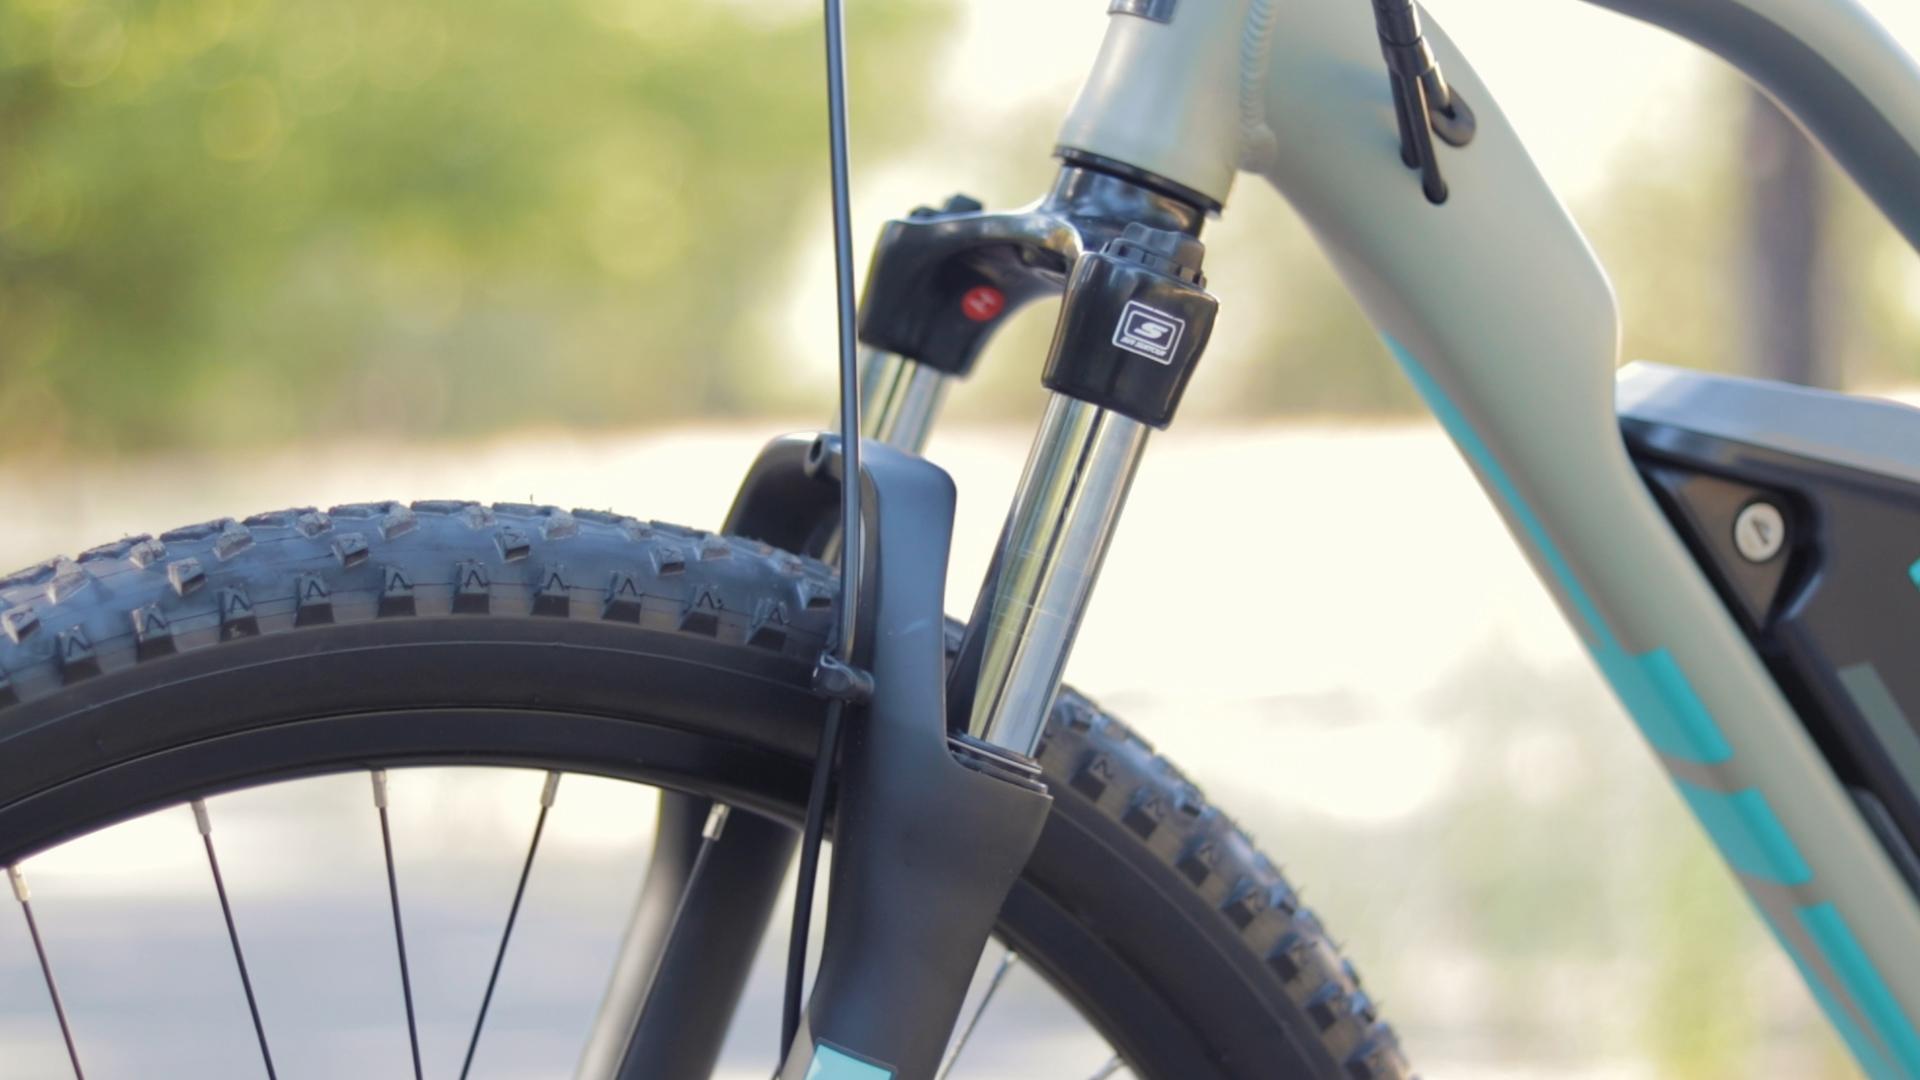 electrified-reviews-izip-trlz-electric-bike-review-suntour-xce-suspension.jpg